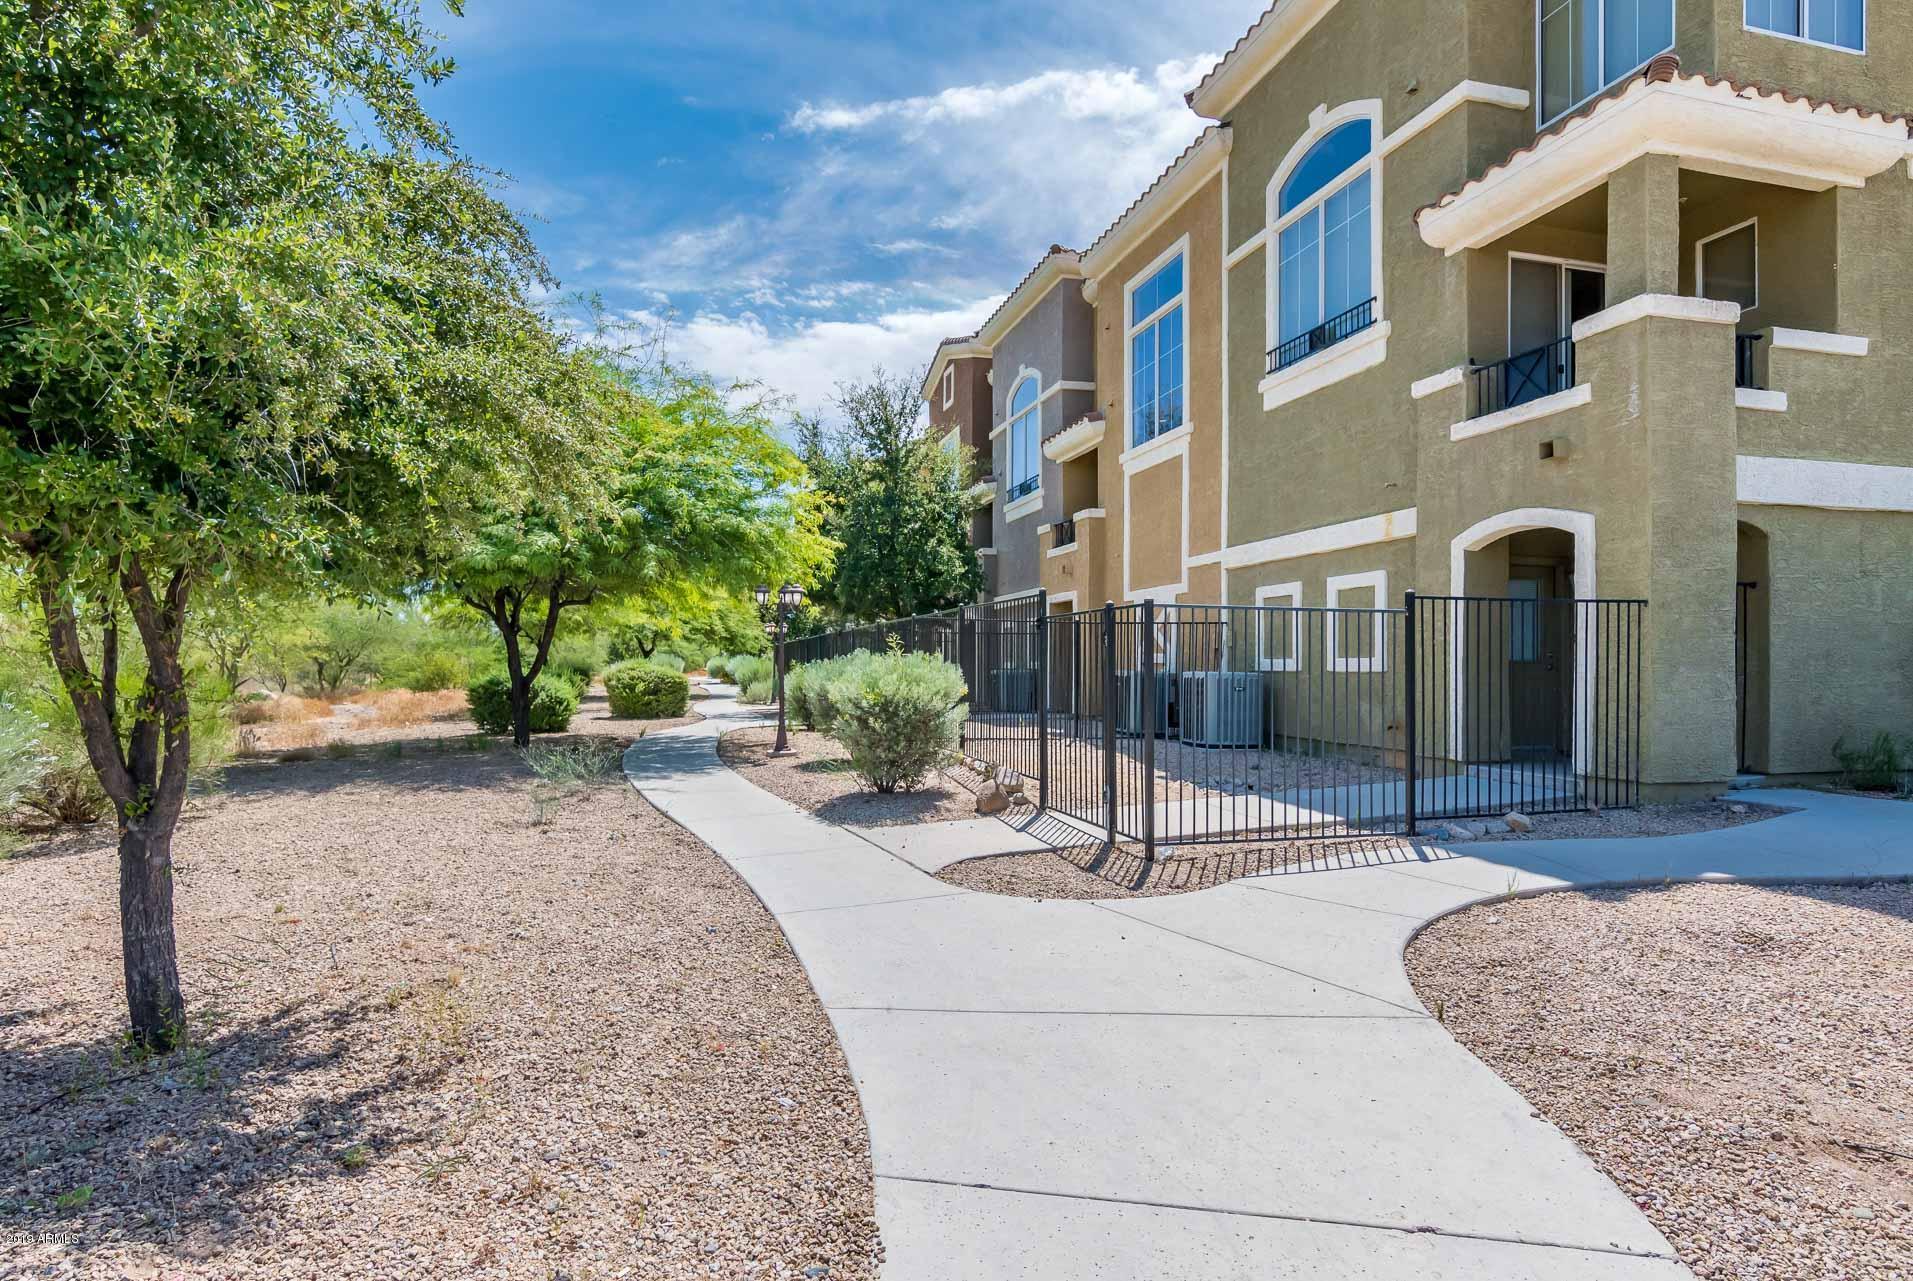 Photo for 22125 N 29th Avenue, Unit 164, Phoenix, AZ 85027 (MLS # 5951494)